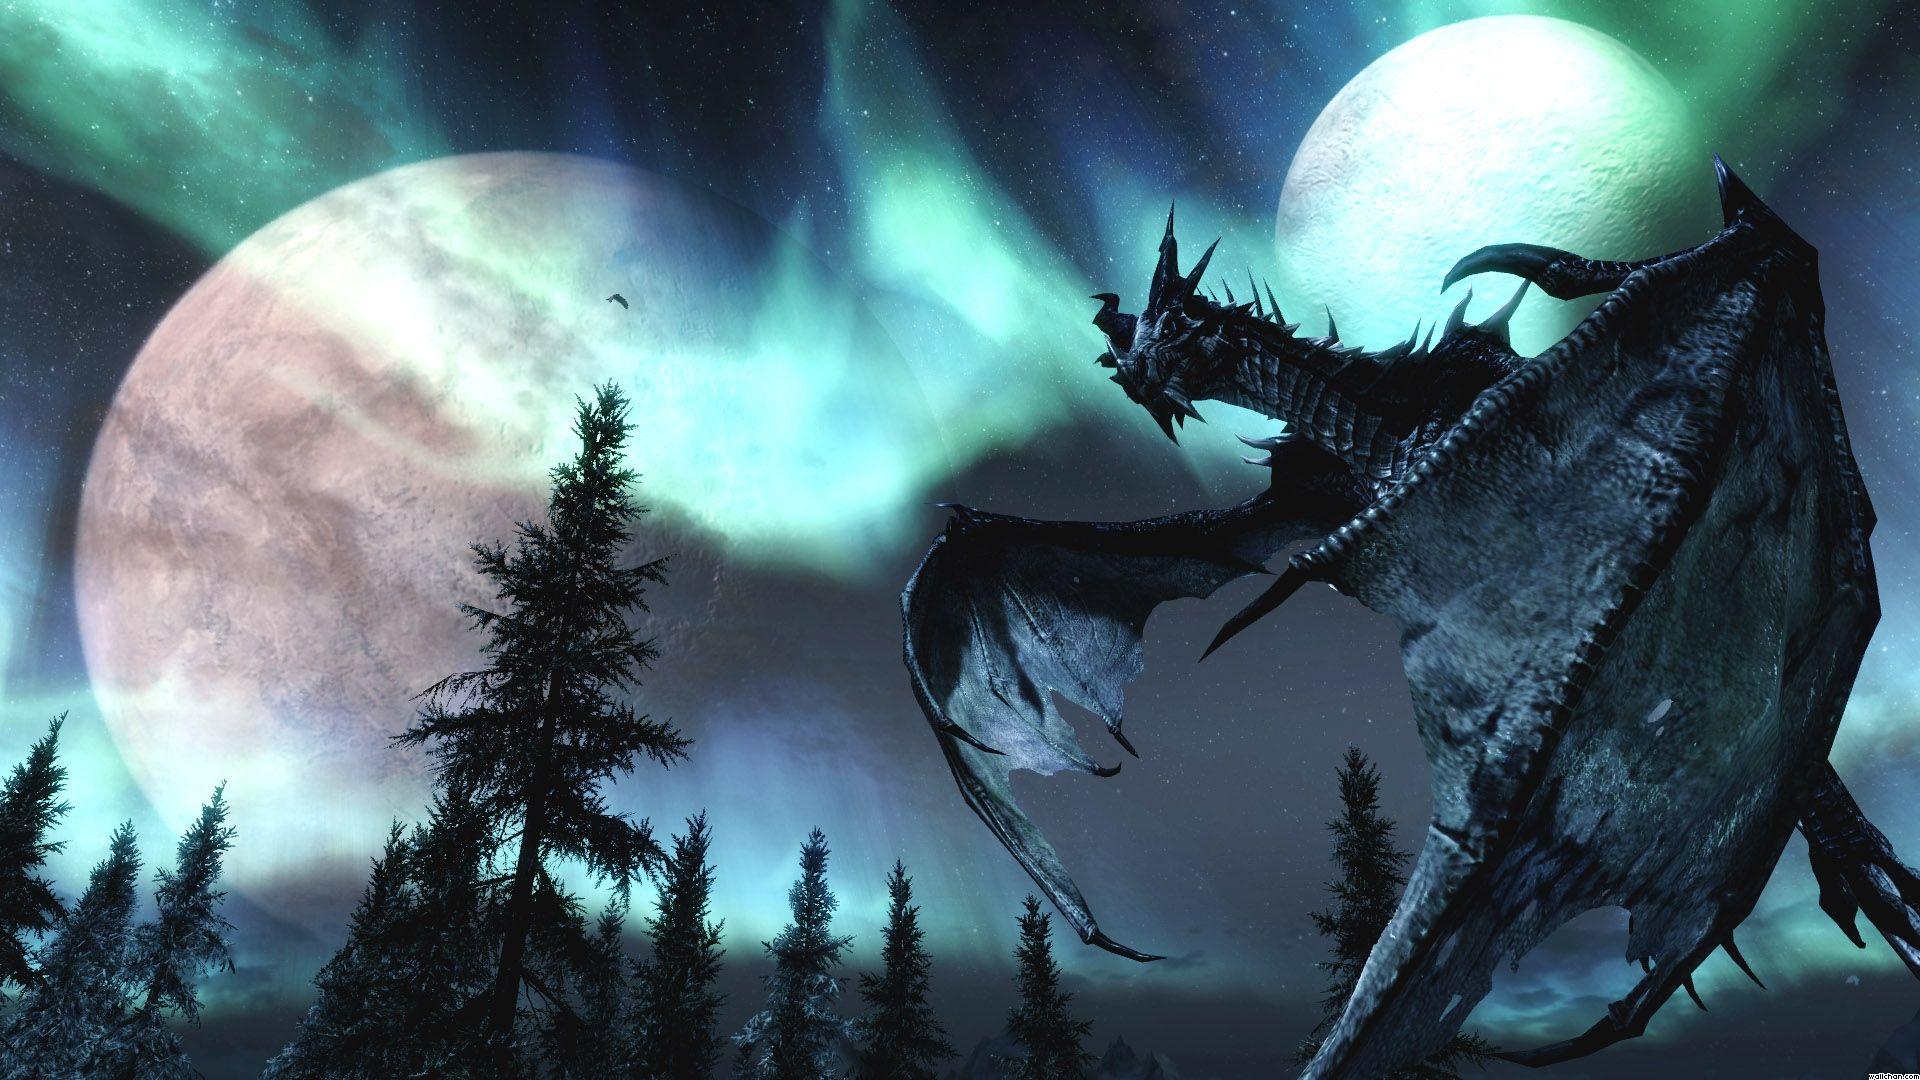 Skyrim httpvideogamedirectorysskyrim the elder scroll nature dragons screenshots fantasy art moons the elder scrolls v skyrim wallpaper space moons hd desktop wallpaper voltagebd Choice Image